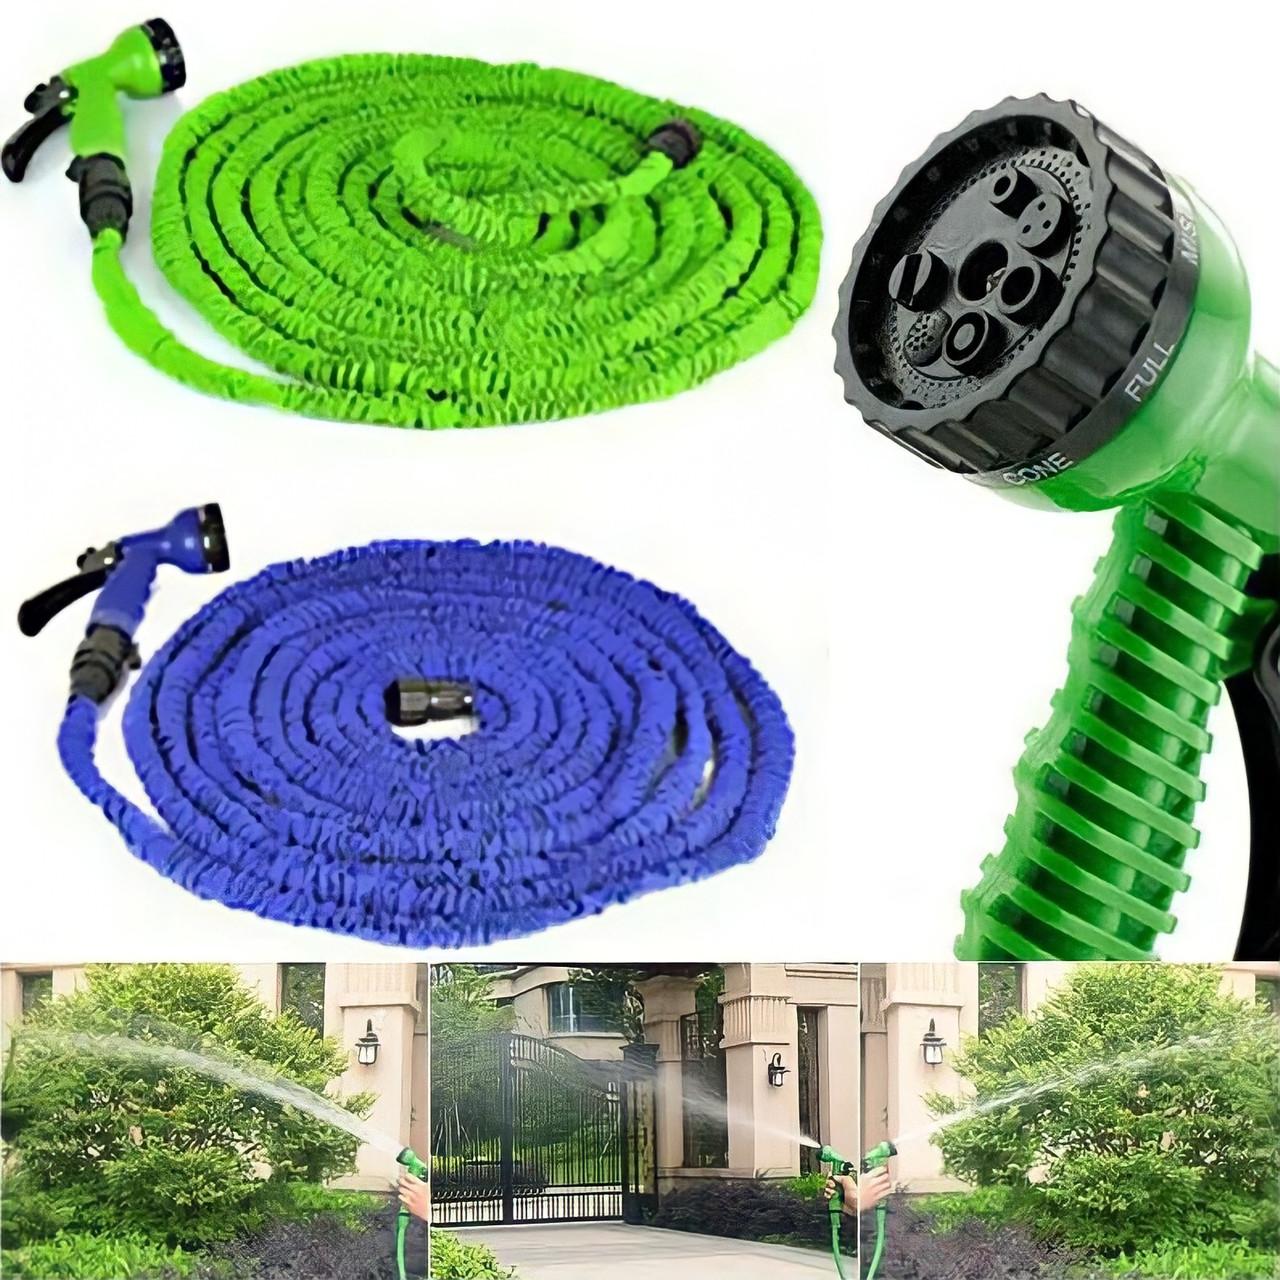 Шланг поливальний X-hose для саду | xhose шланг для поливу